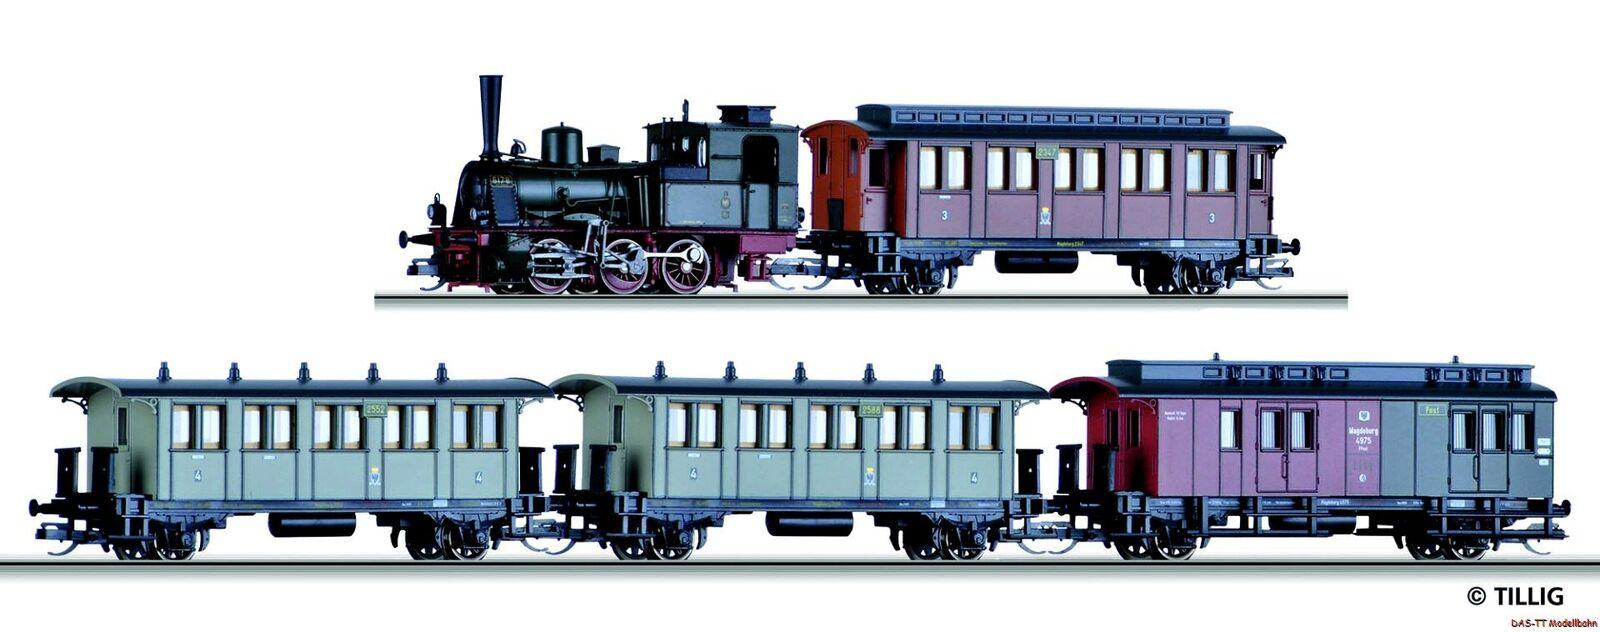 TT viajeros-set 4 vagones + br89 kpev EP. I Tillig 01720 nuevo